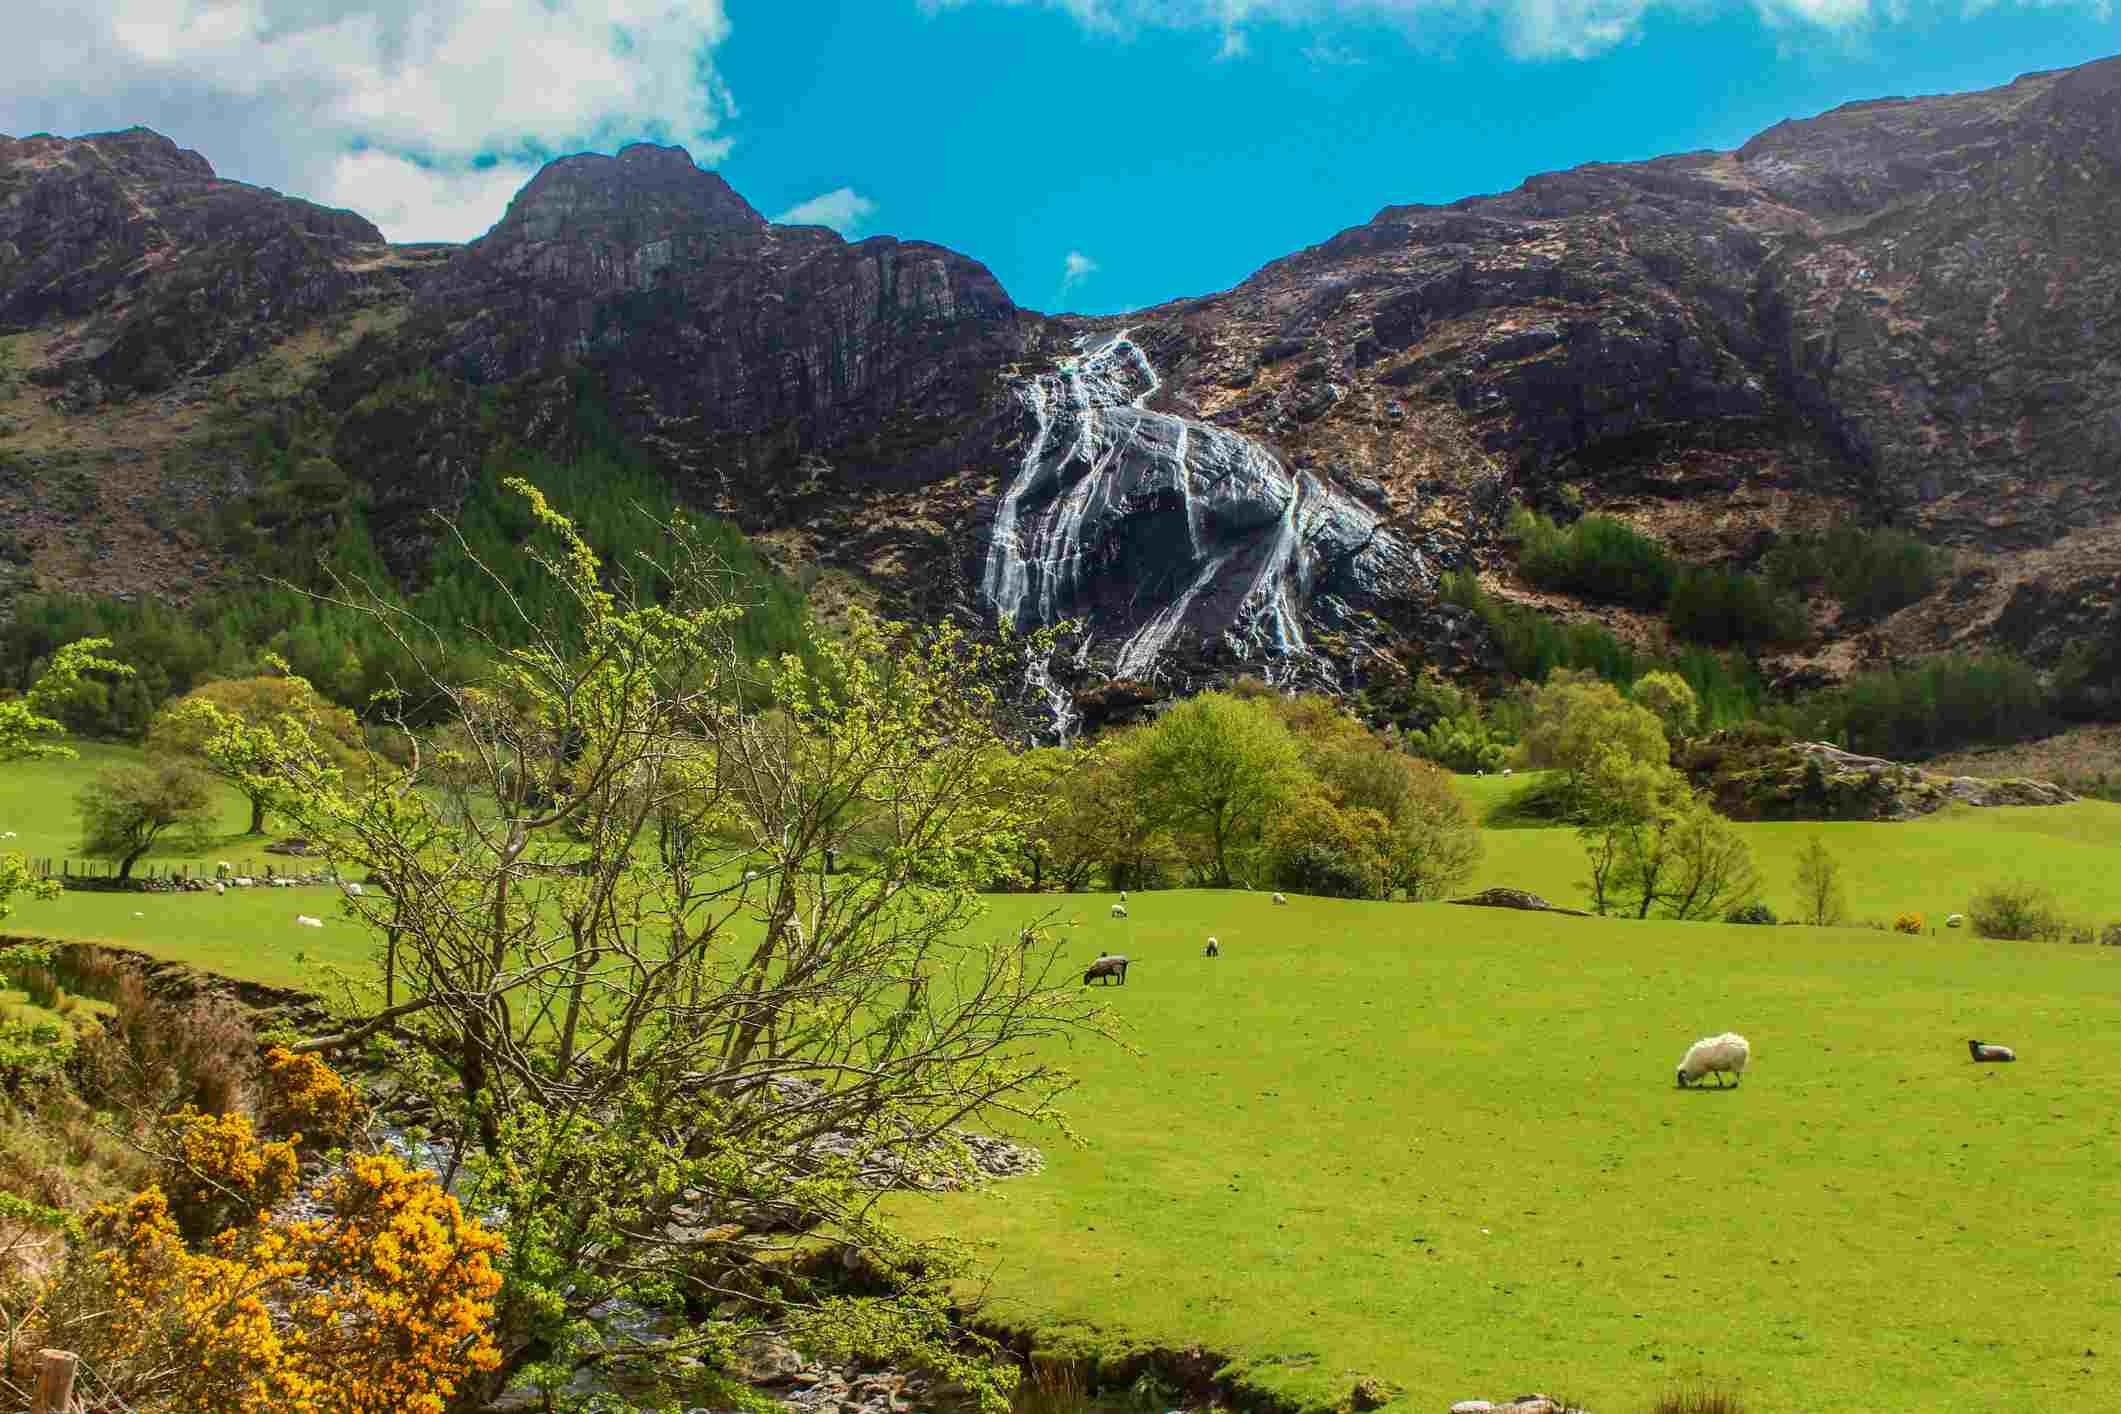 veil waterfall in ireland